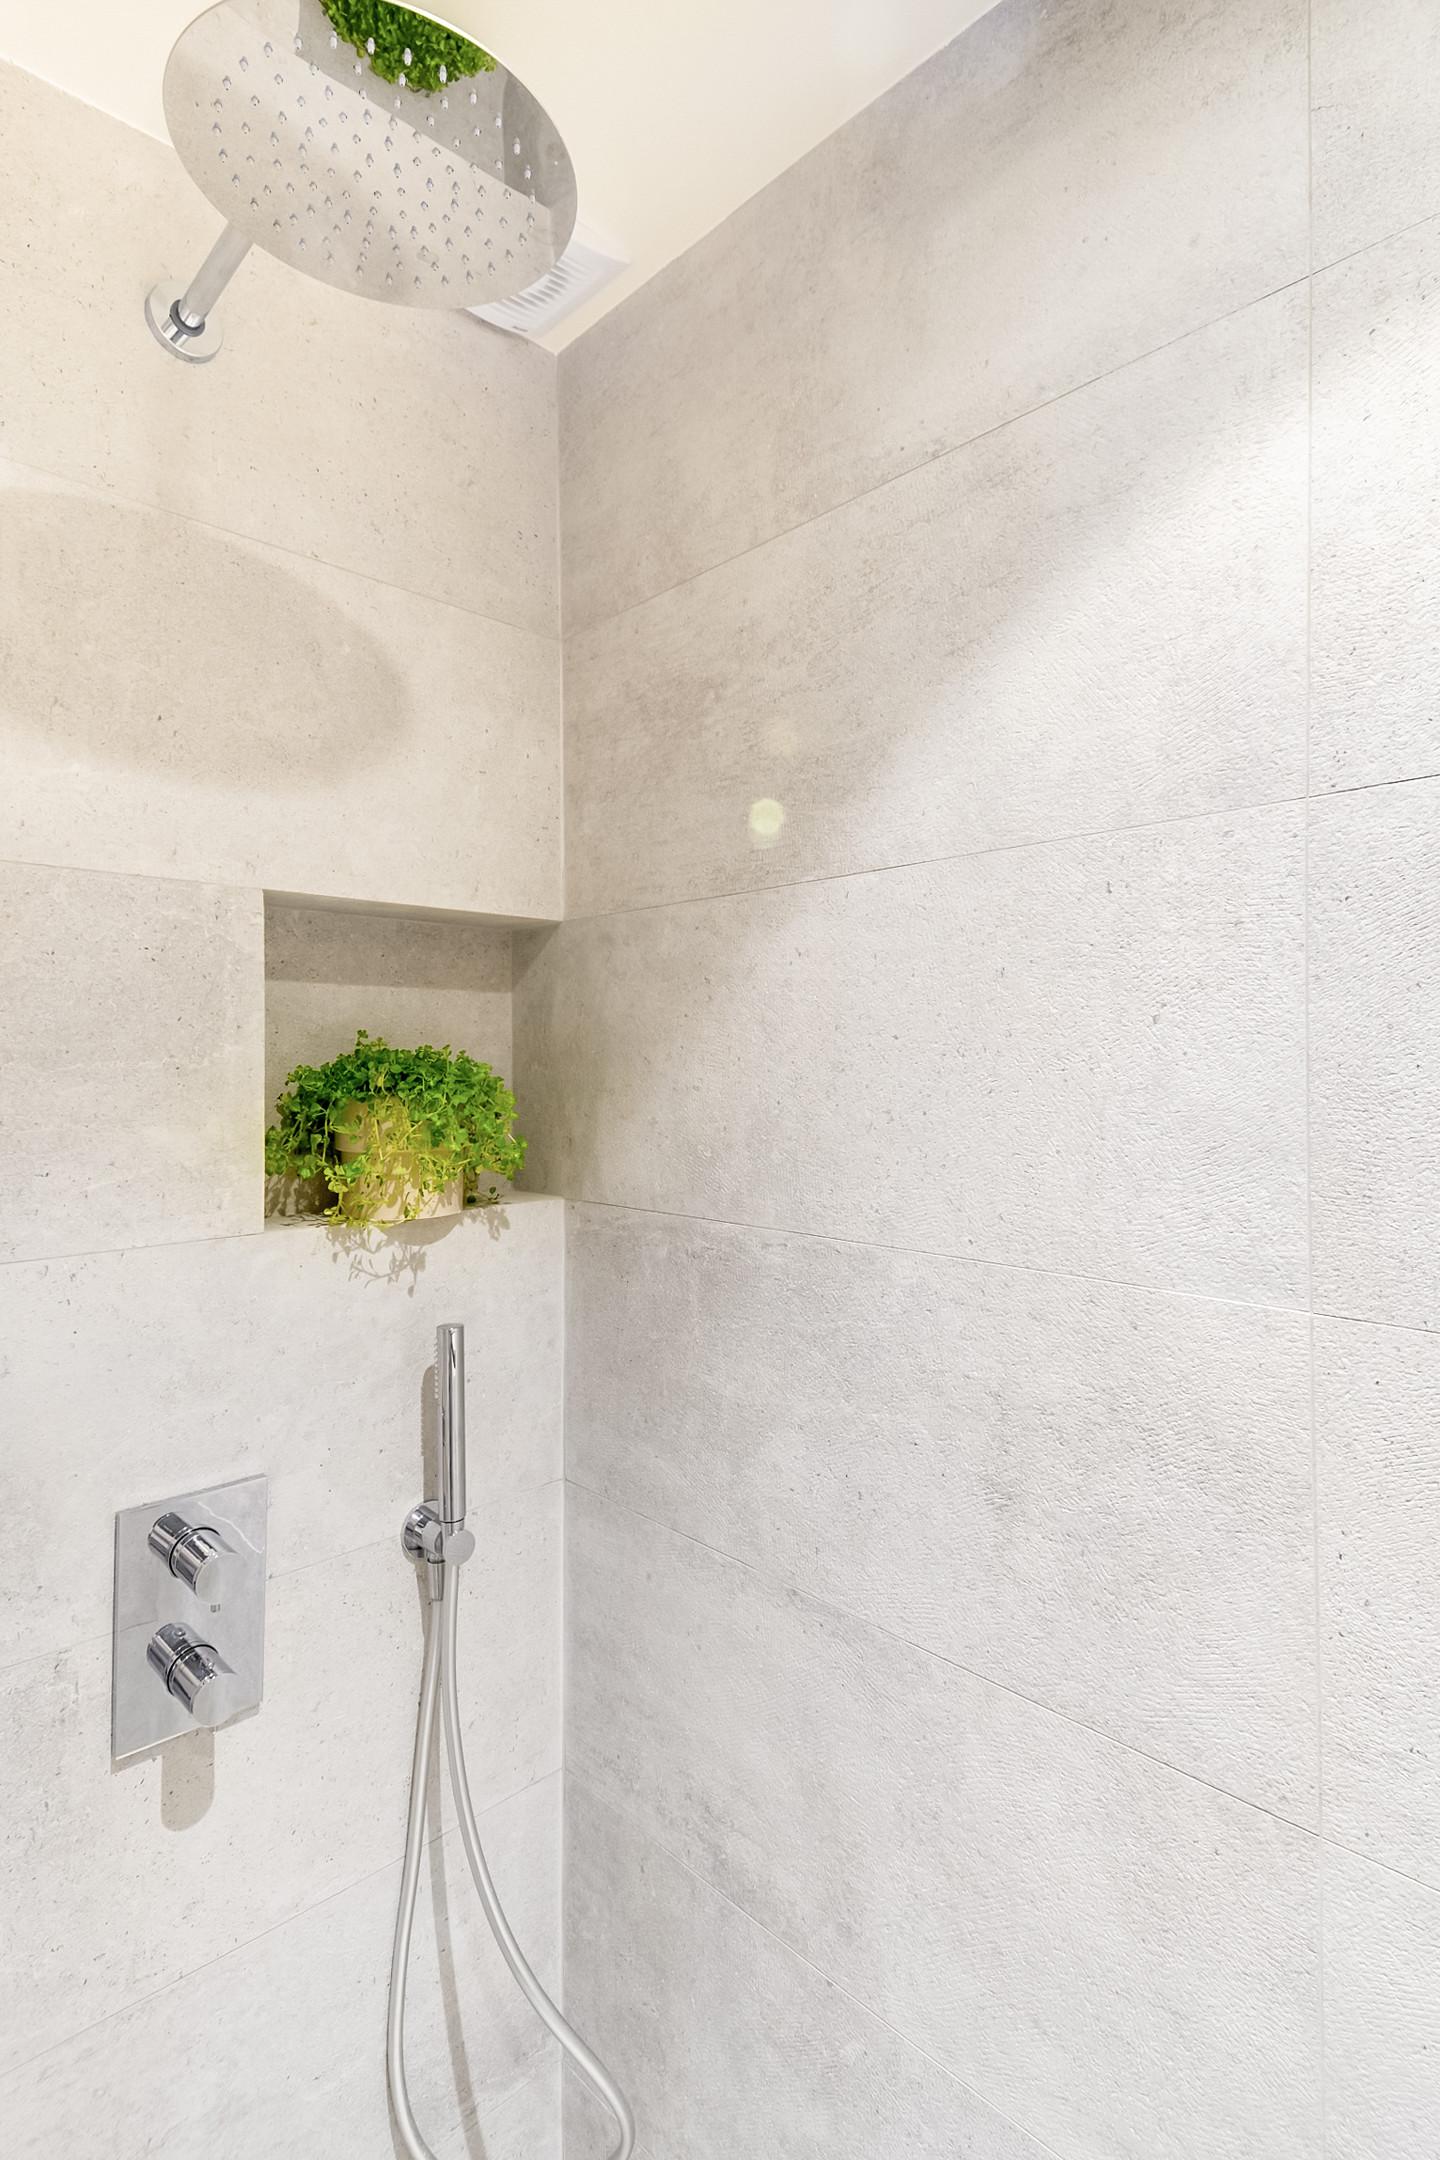 Deze kleine badkamer van 2,5m2 is leuk en praktisch ingericht!